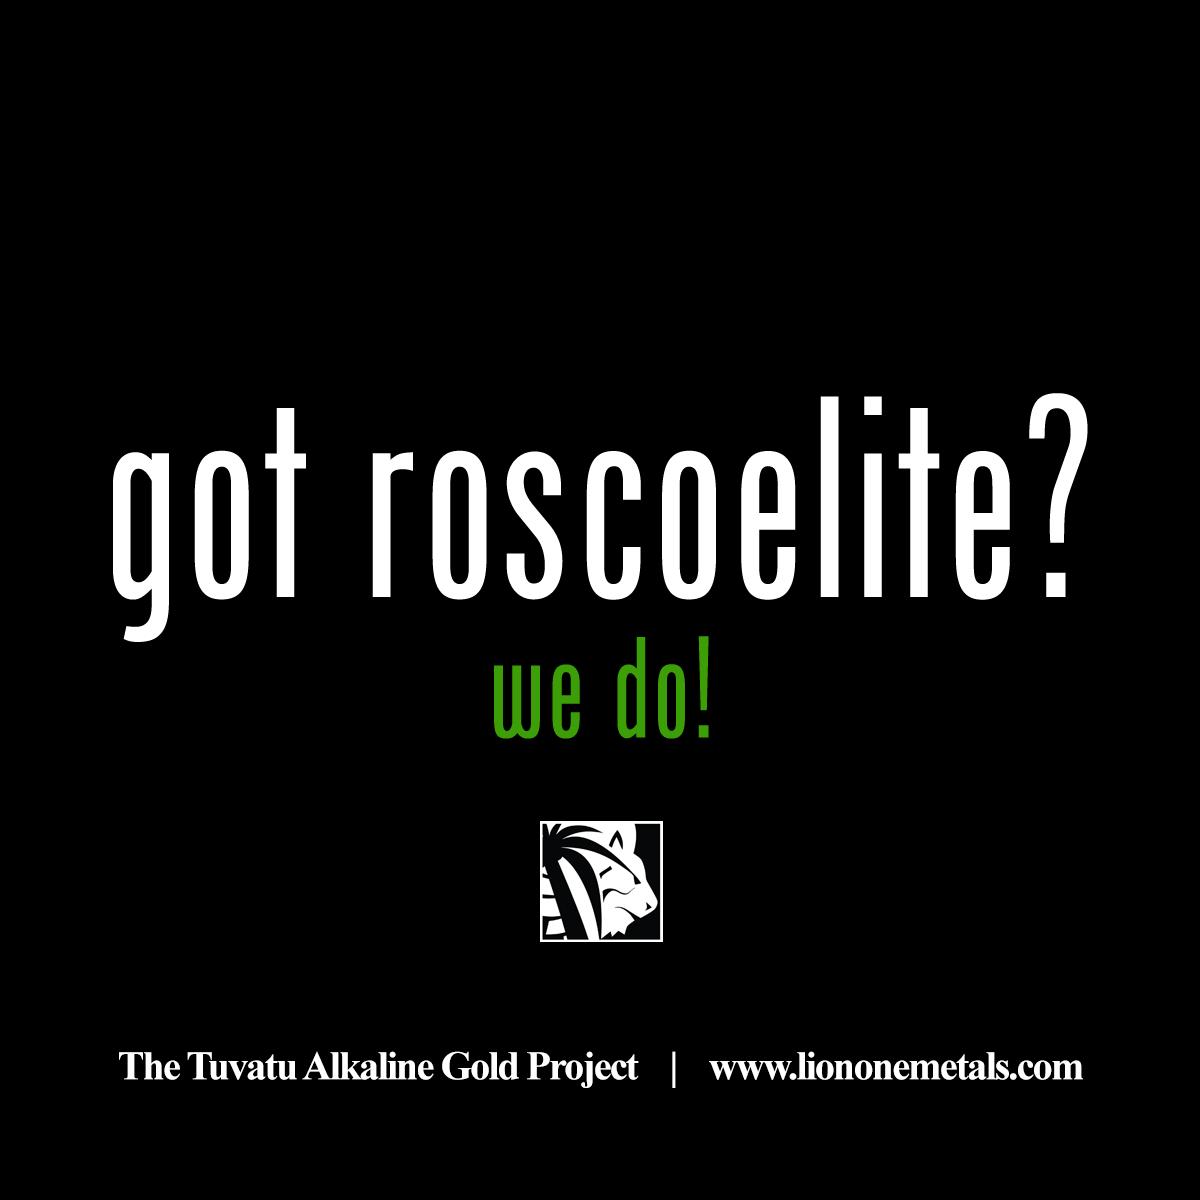 got roscoelite? we do! #alkaline #gold #tuvatu #caldera #exploration #mining #green $LIO $LOMLF